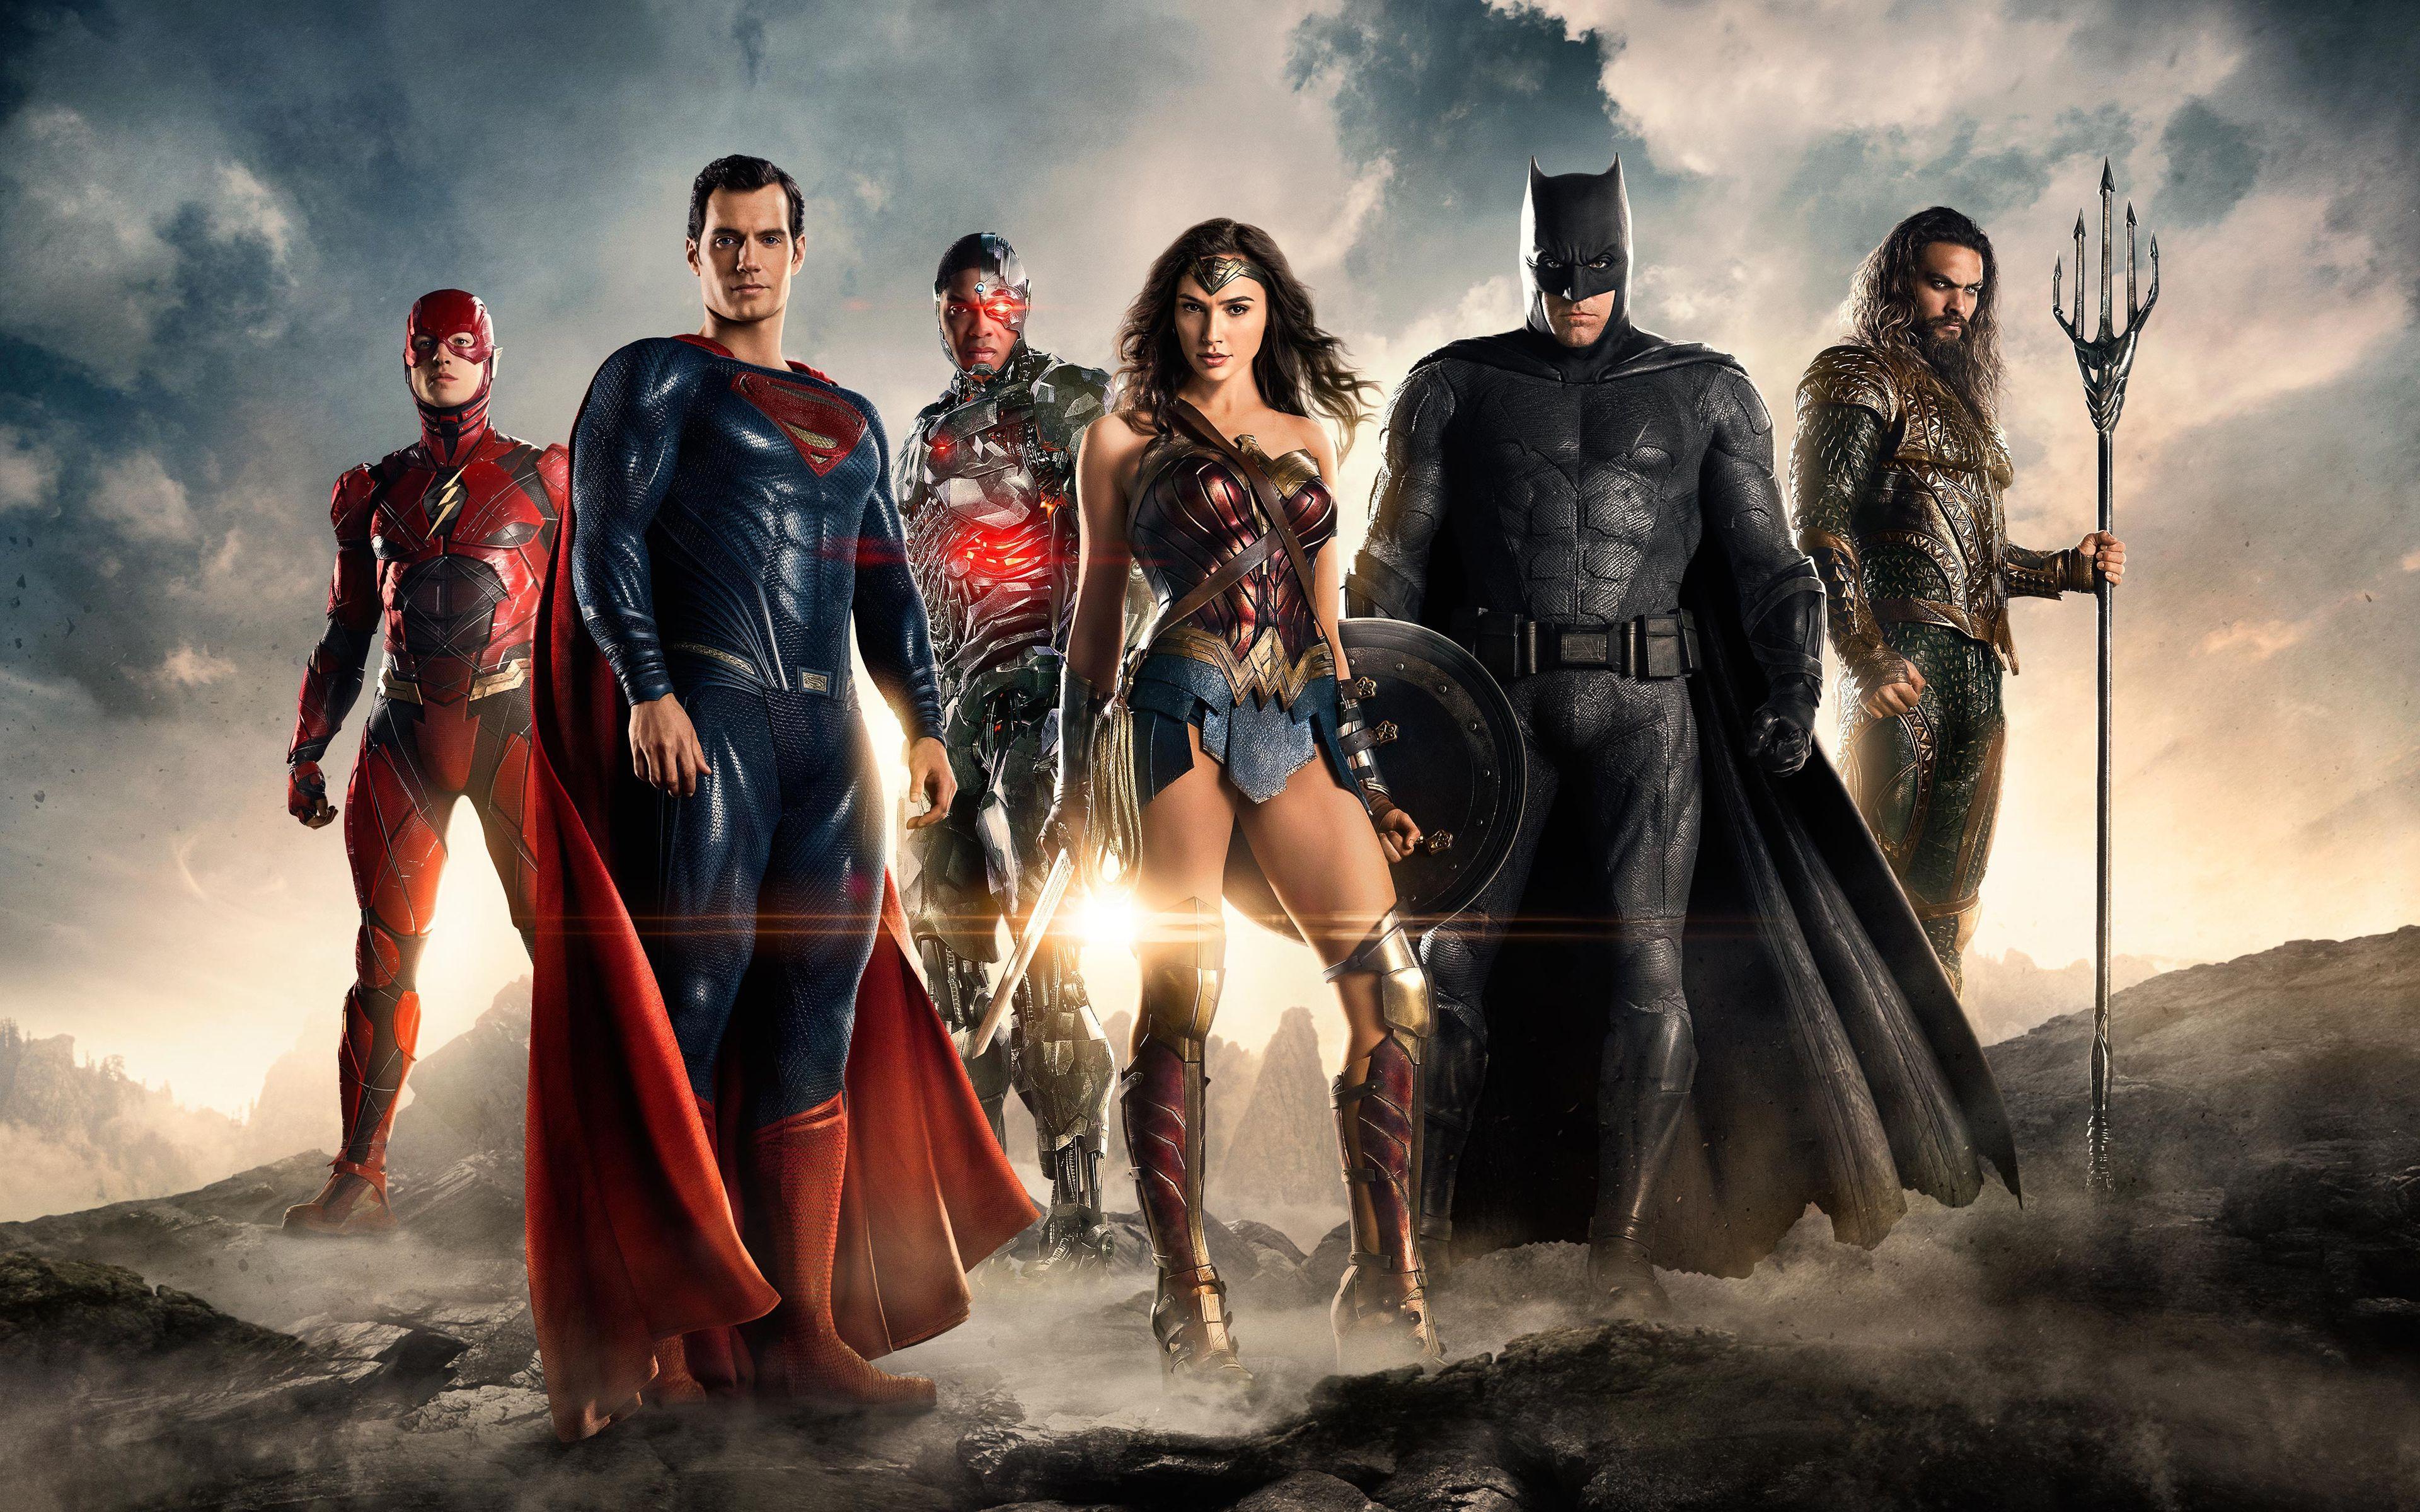 Justice League Hd Desktop Wallpapers Top Free Justice